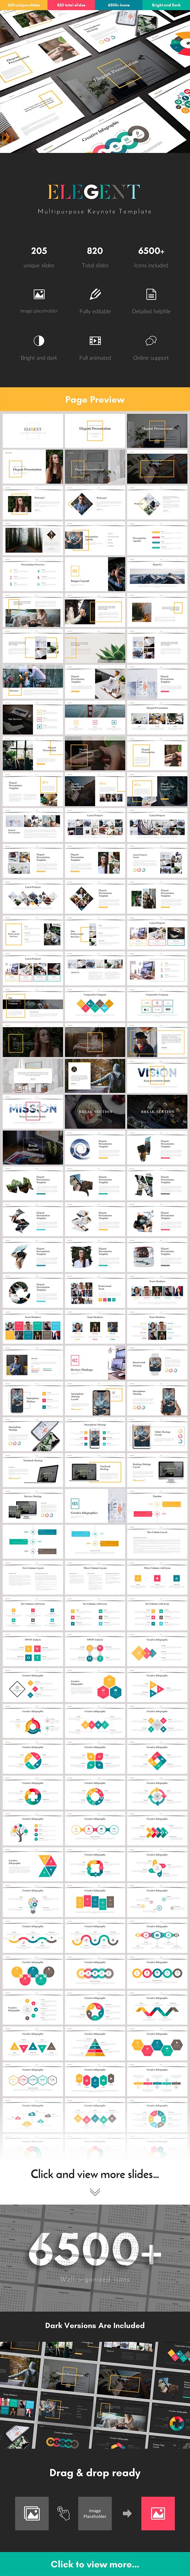 Elegent Multipurpose Keynote Template - Business Keynote Templates